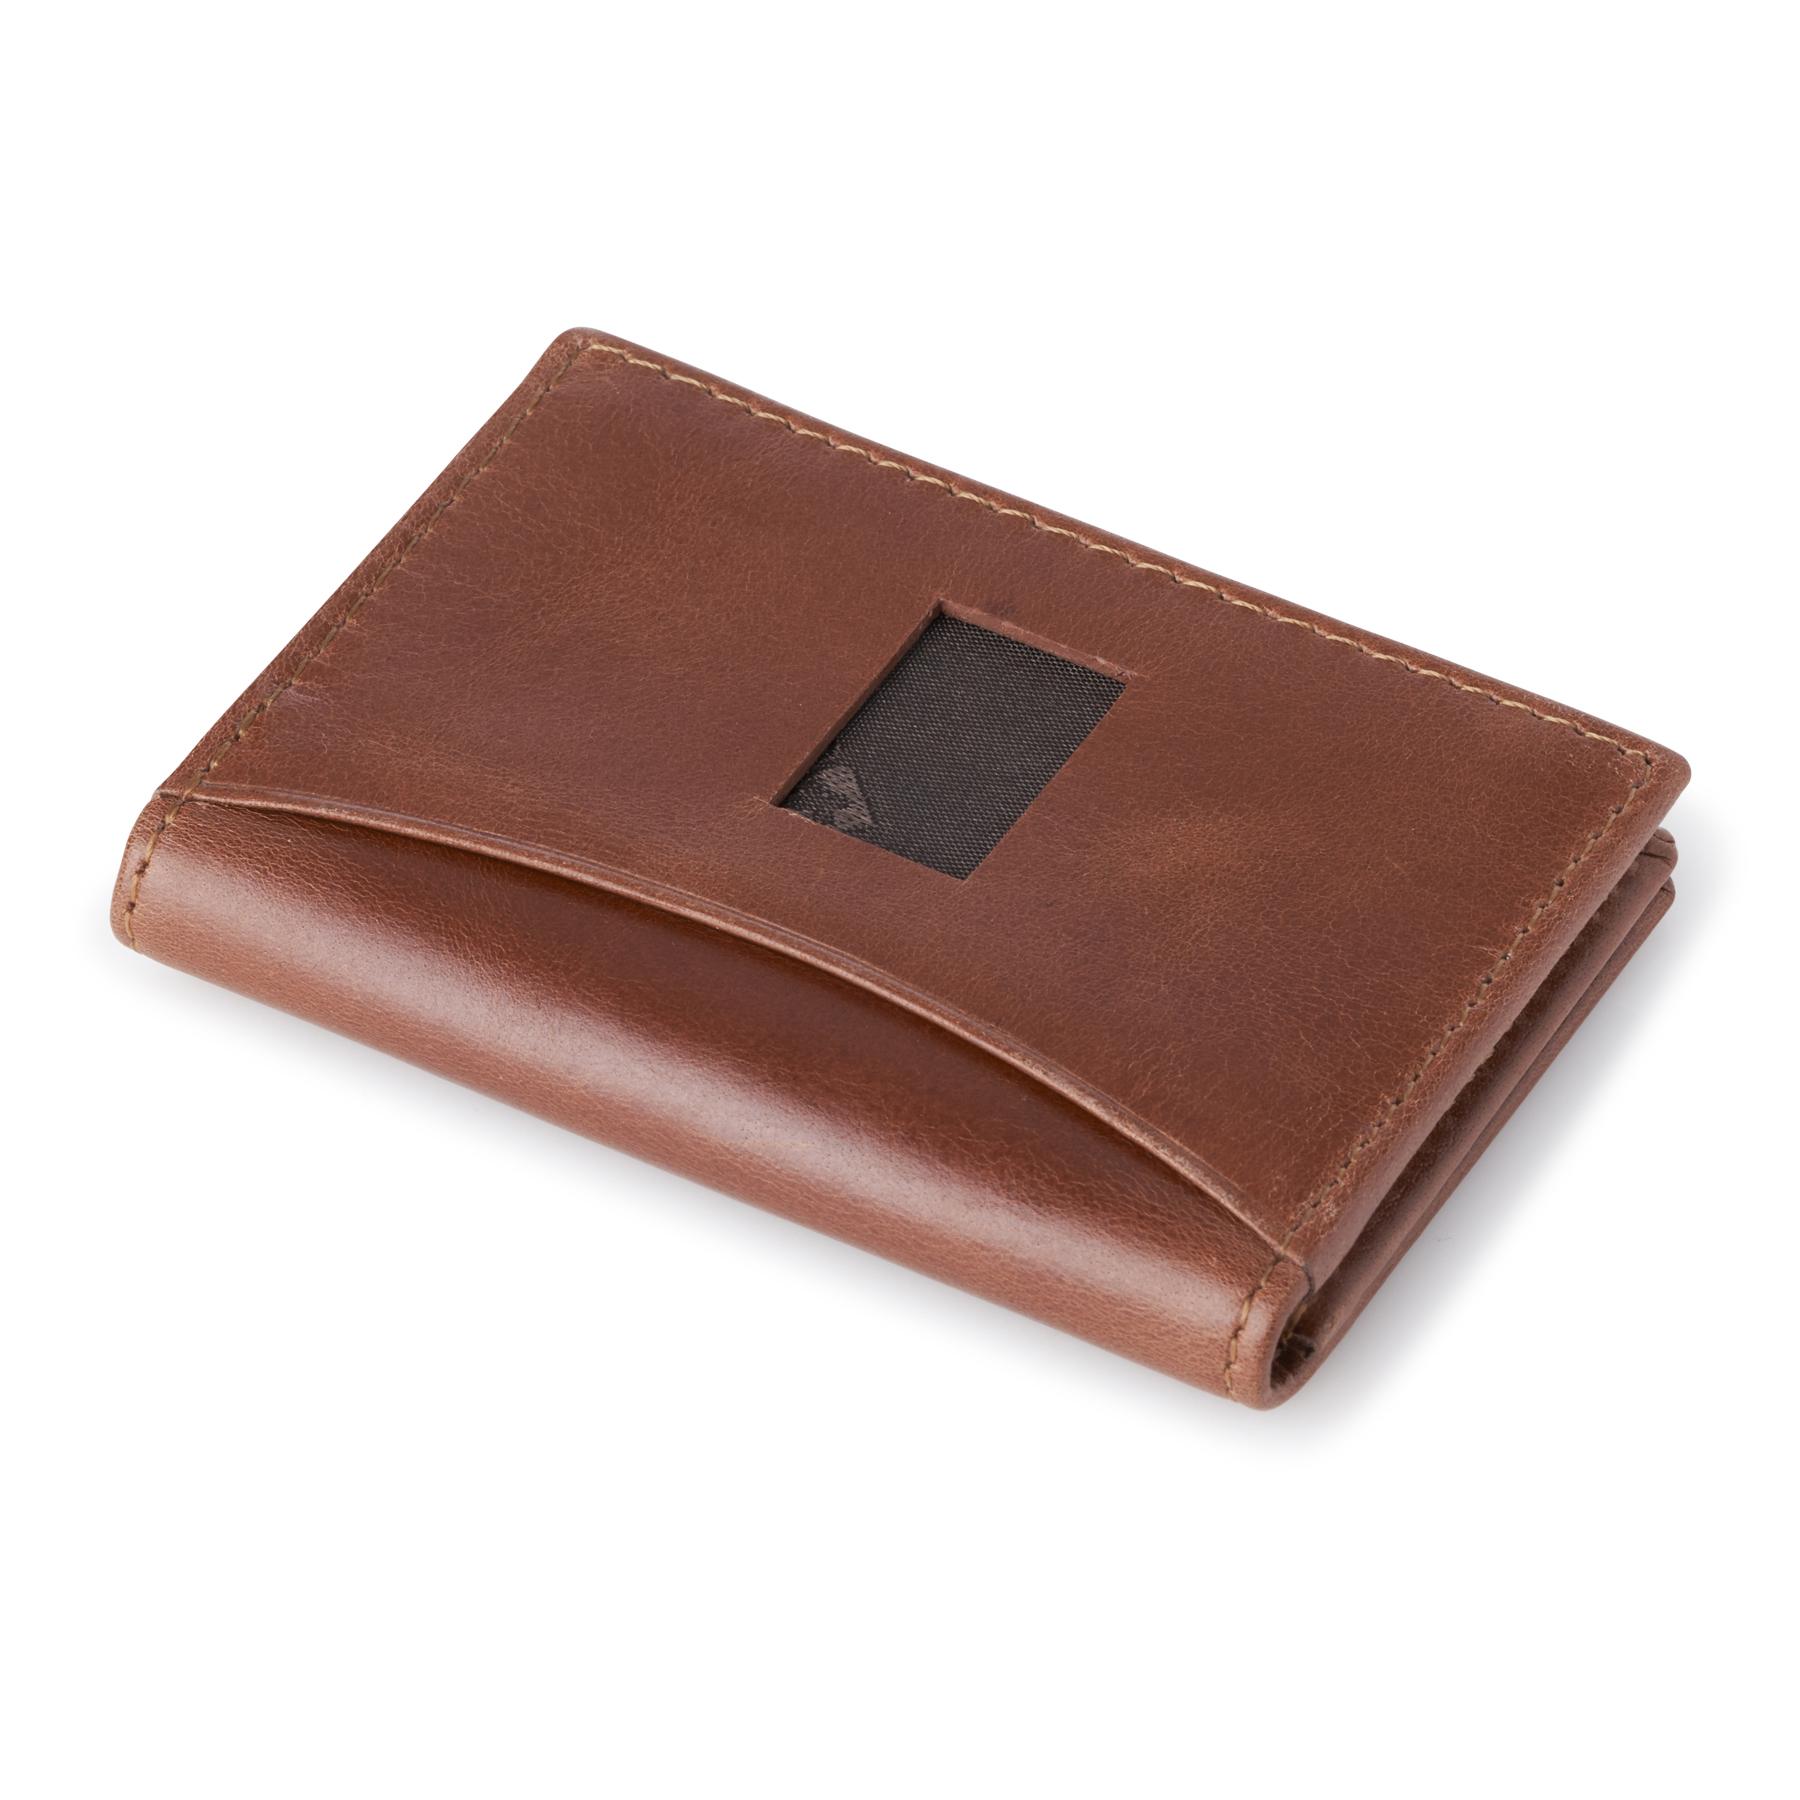 Alpine-Swiss-RFID-Leather-Business-Card-Wallet-Minimalist-ID-Window-Card-Holder thumbnail 28